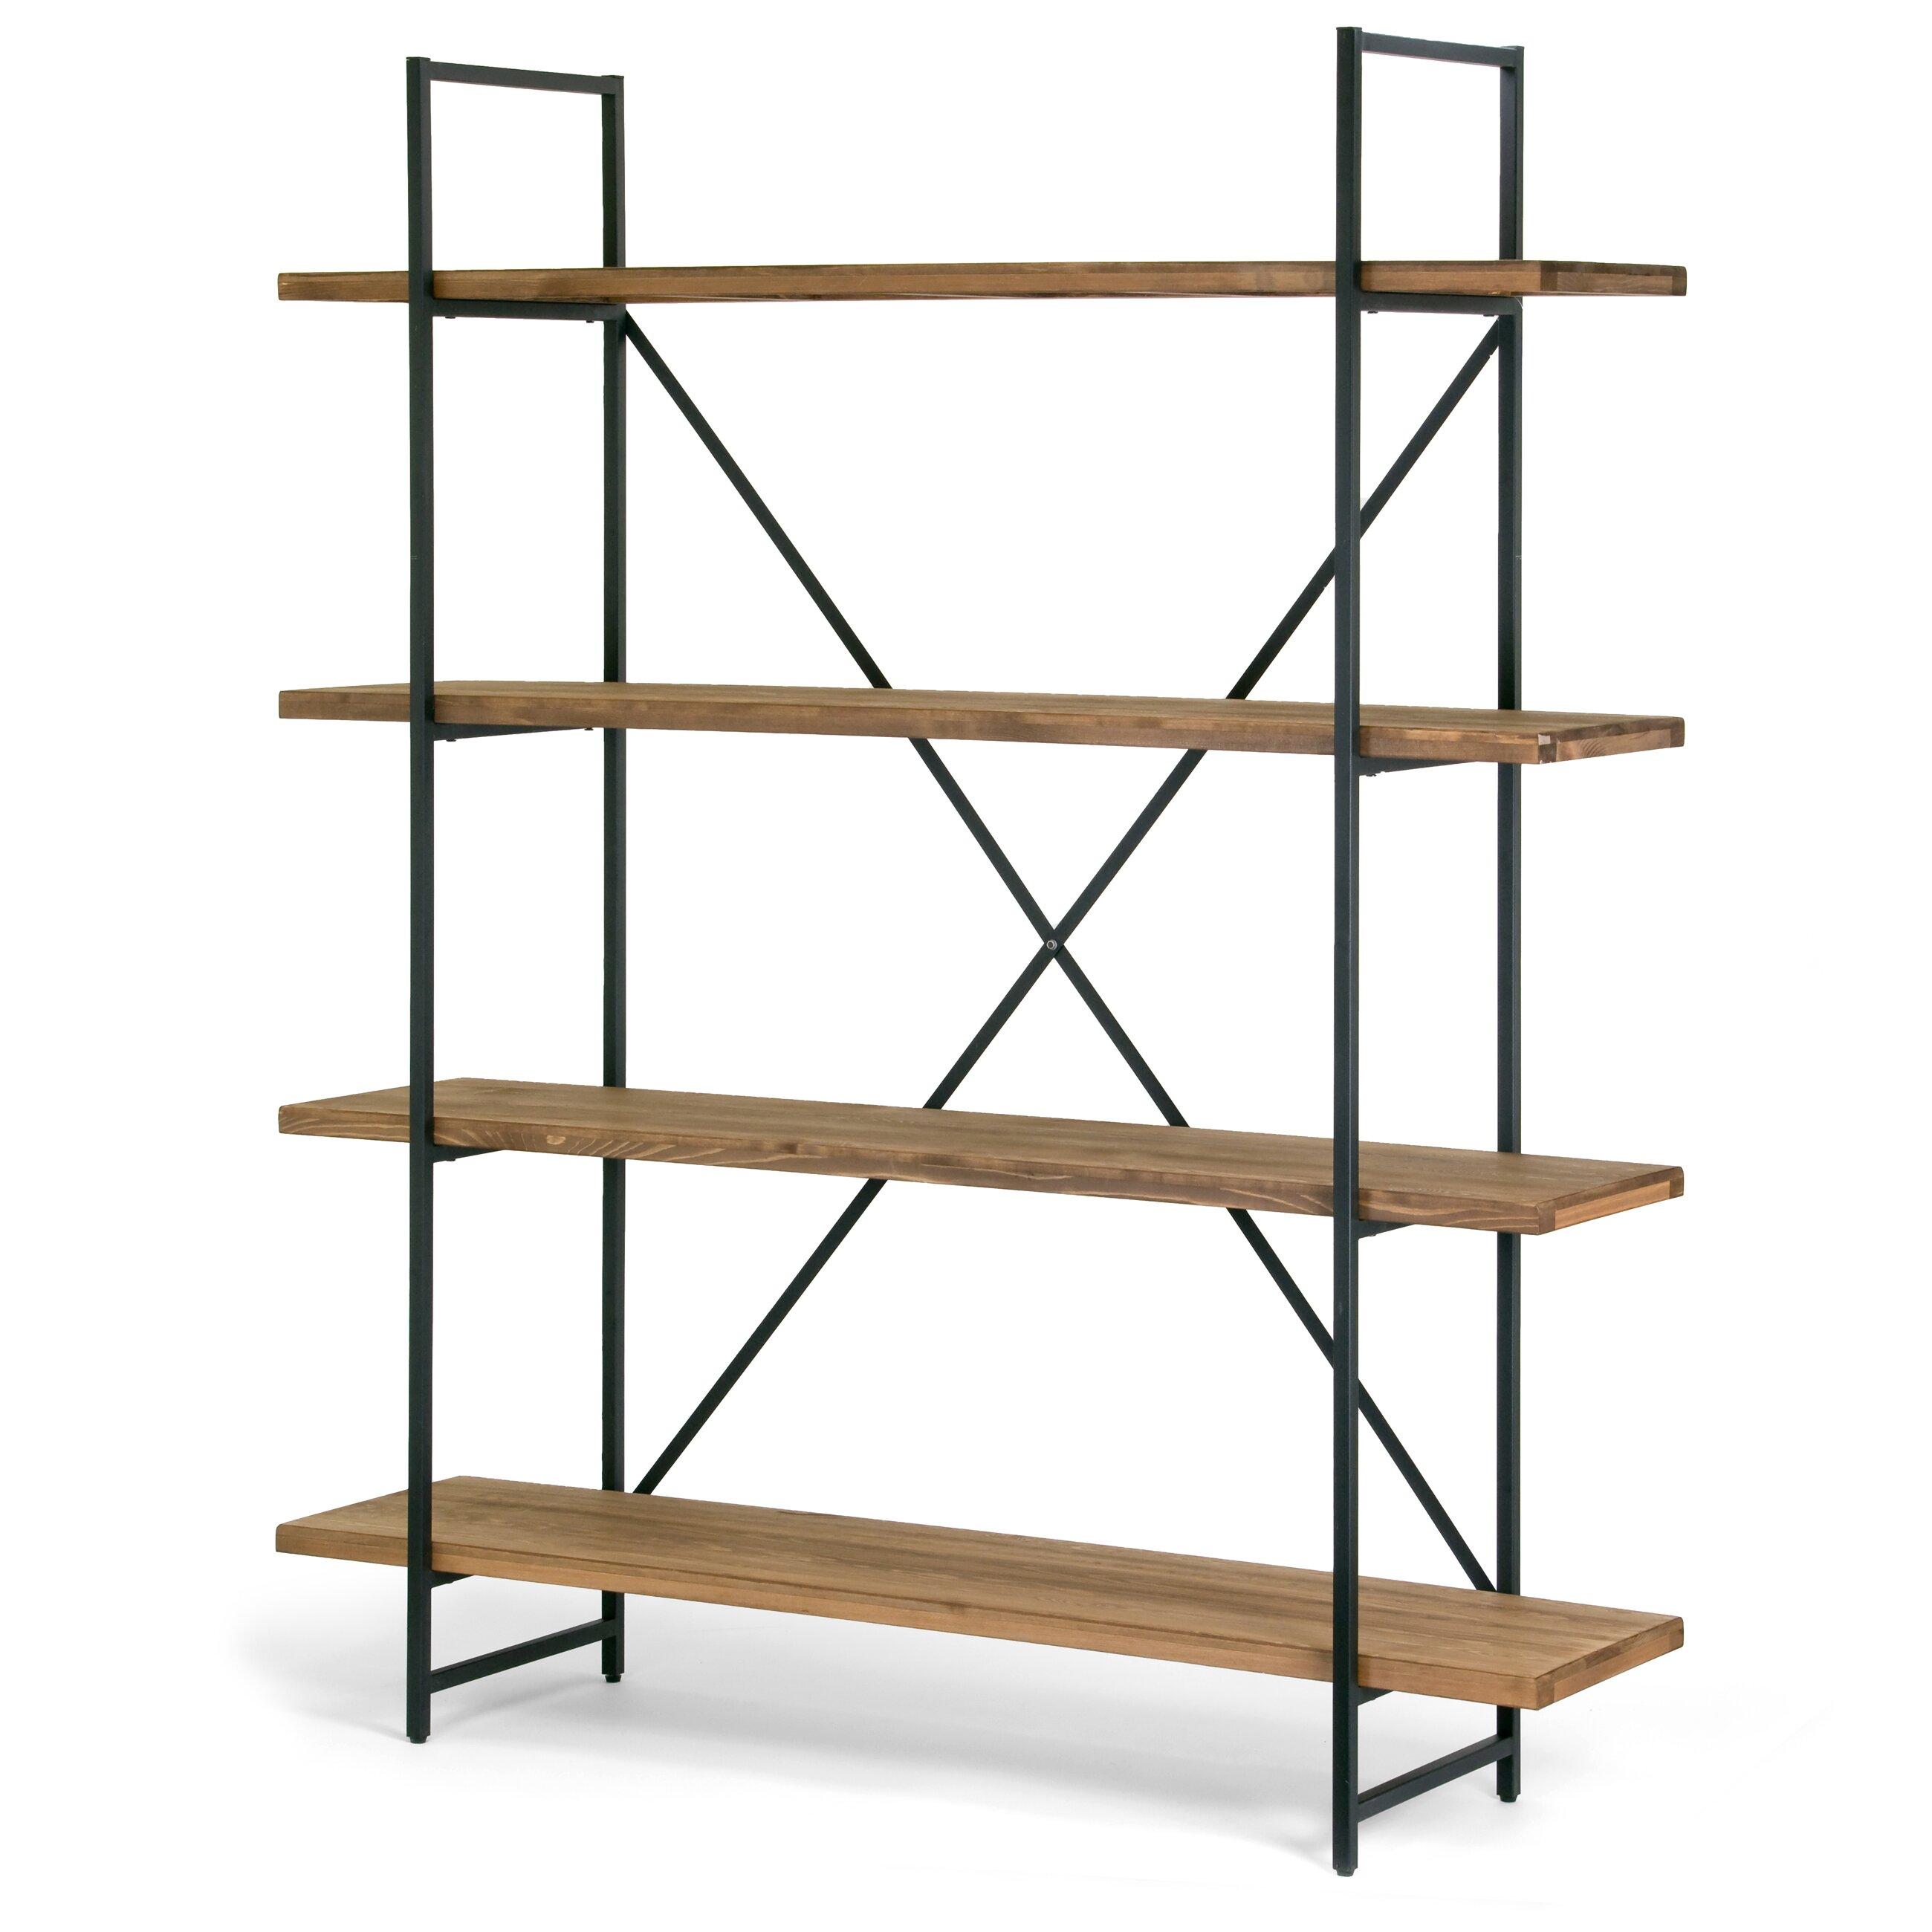 glamour home decor ailis 75 etagere bookcase reviews. Black Bedroom Furniture Sets. Home Design Ideas